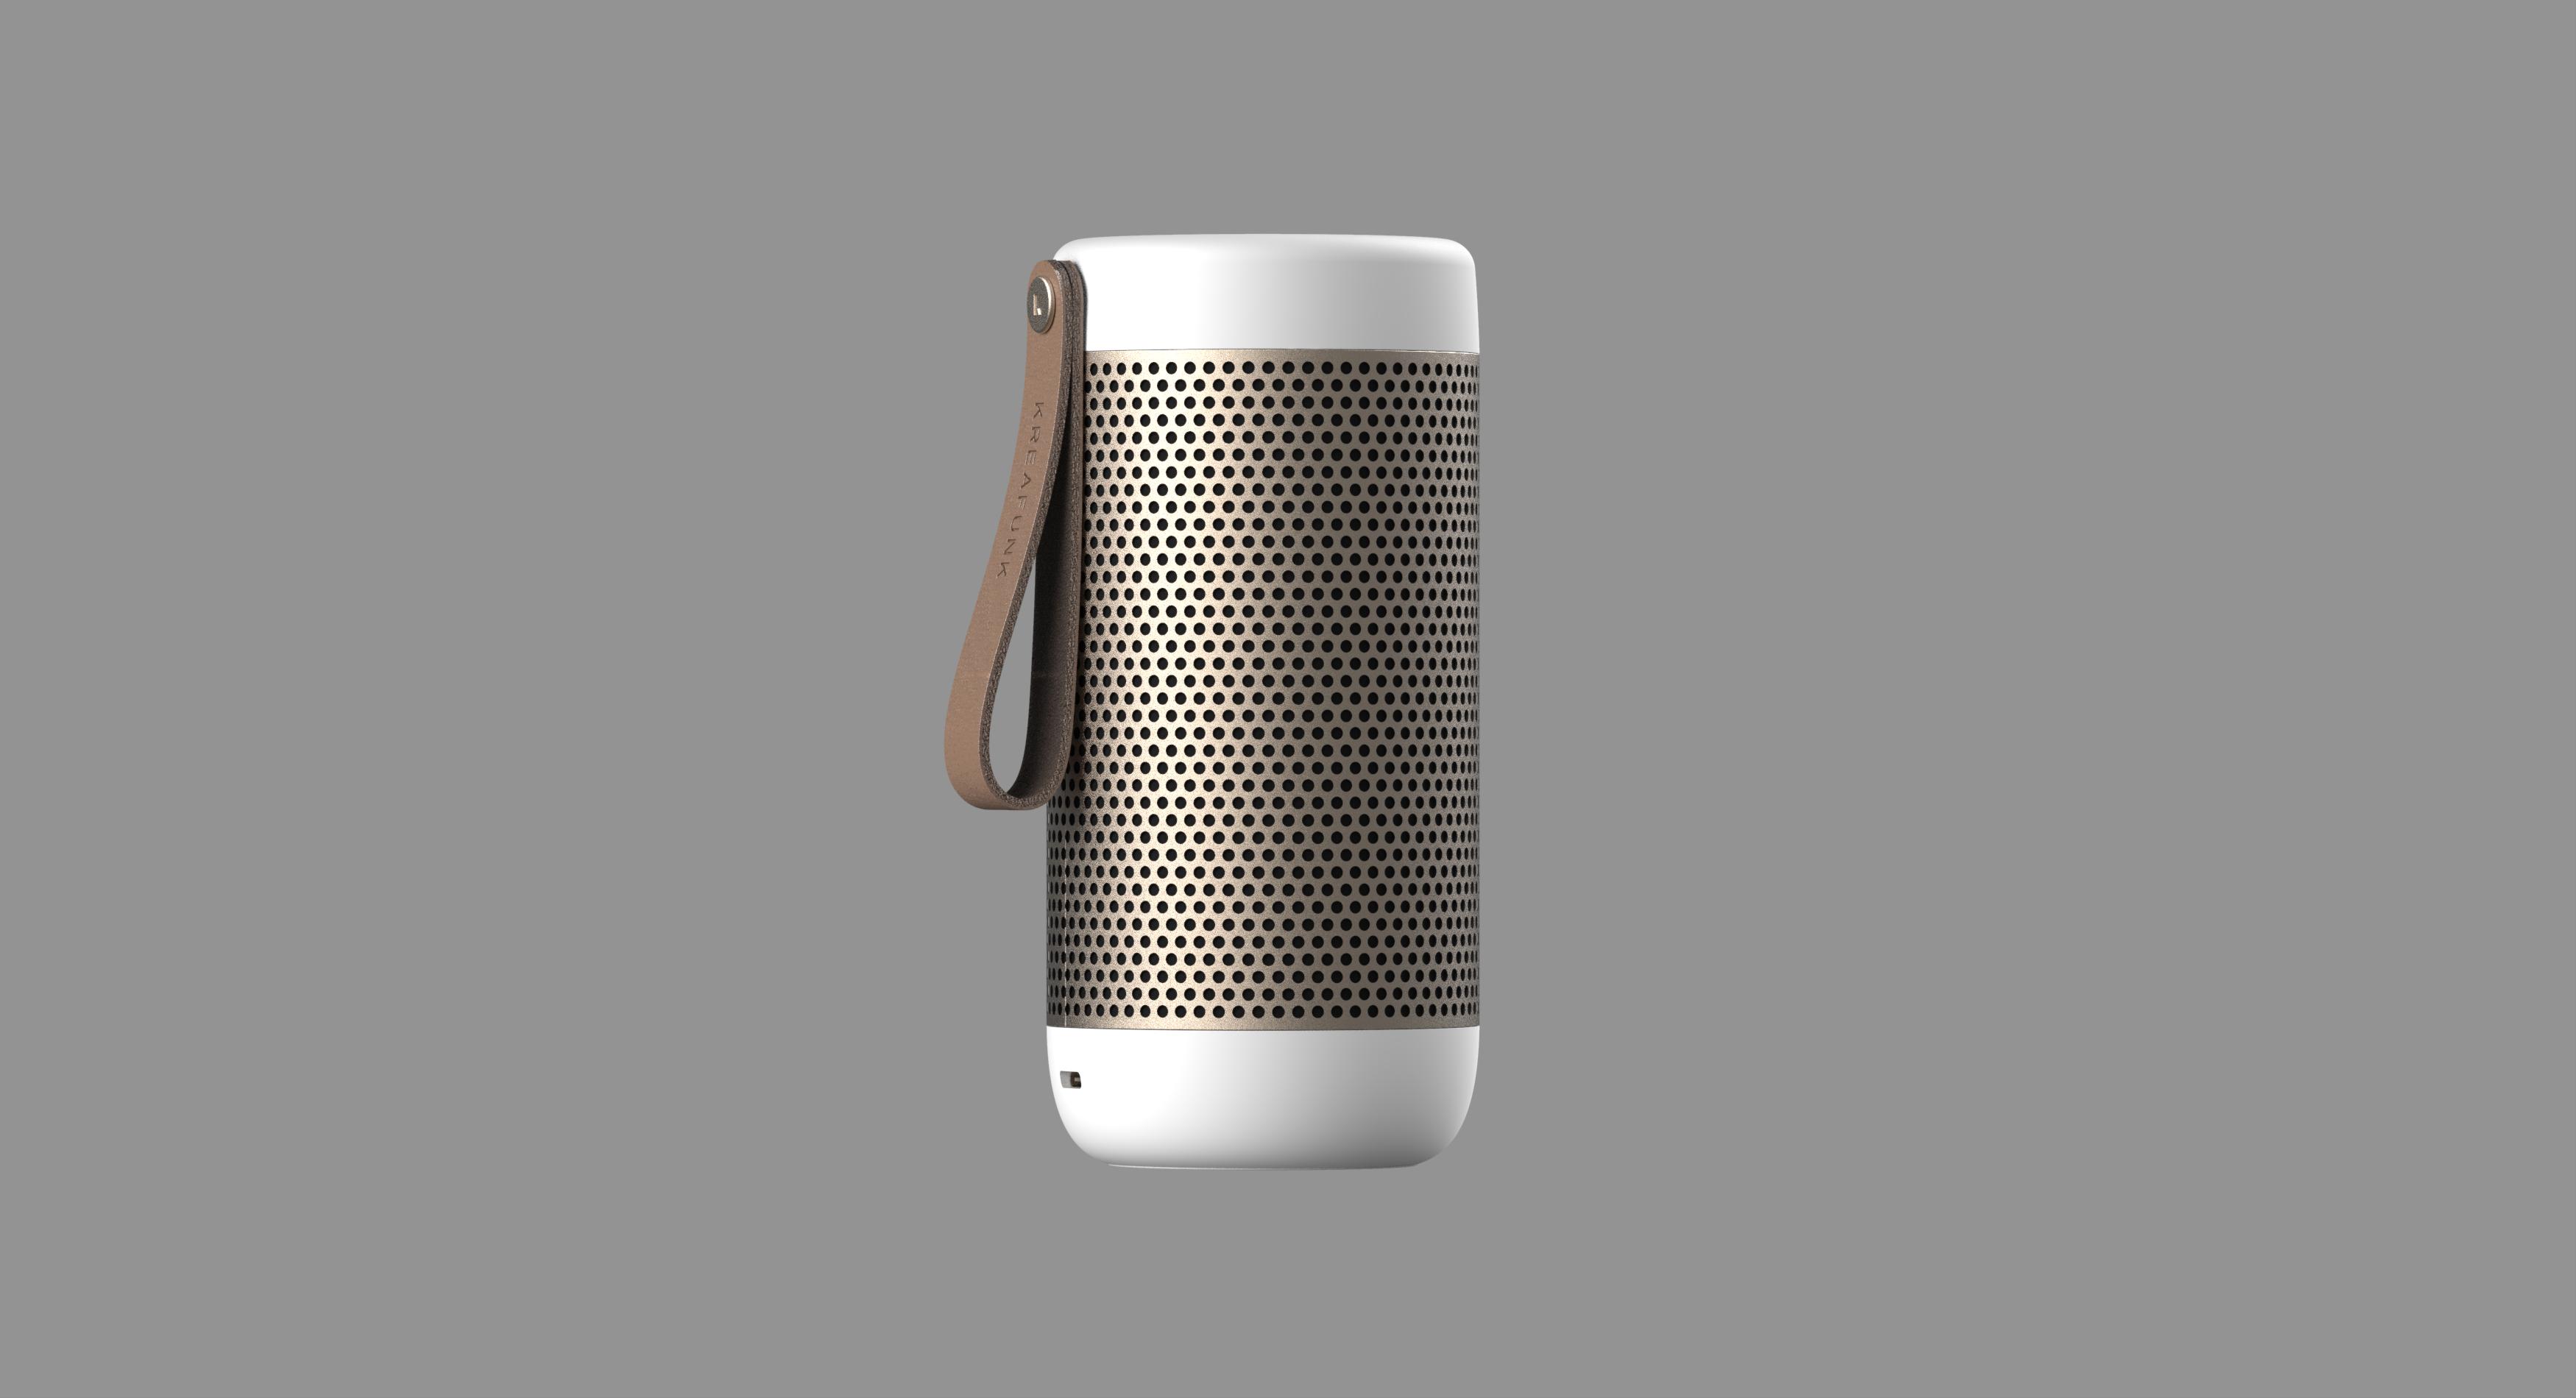 KreaFunk - aCOUSTIC Bluetooth Speaker - White (Kfwt41)